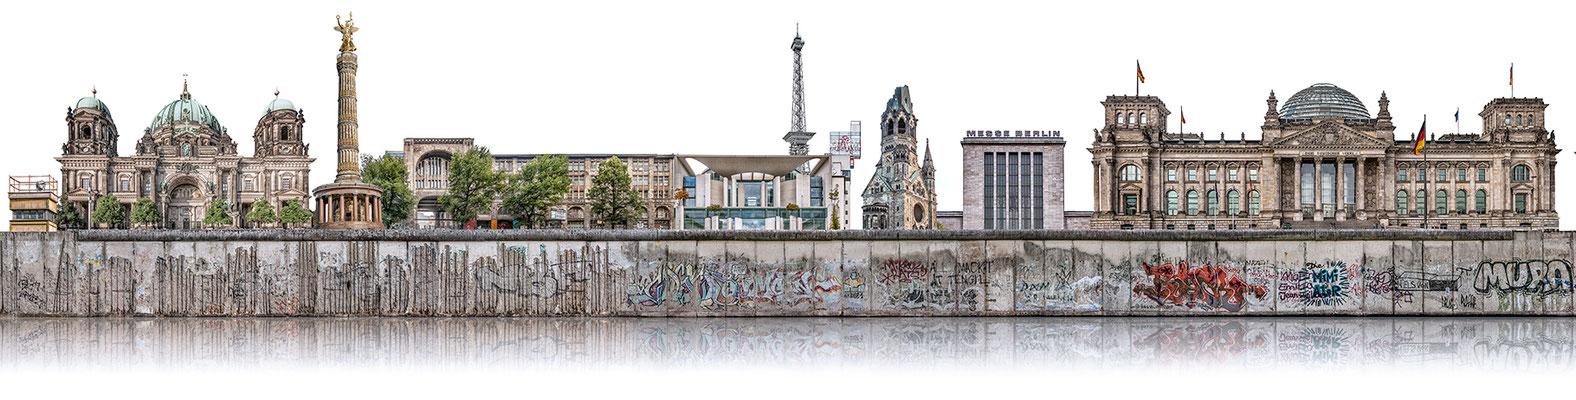 Berliner Mauer 4a  ·  200 x 50 cm · Leinwand auf Keilrahmen: € 830,- · Aludibond: € 1.040,- · Acrylglas auf Aludibond: € 1.270,-  · © Stefan Korff